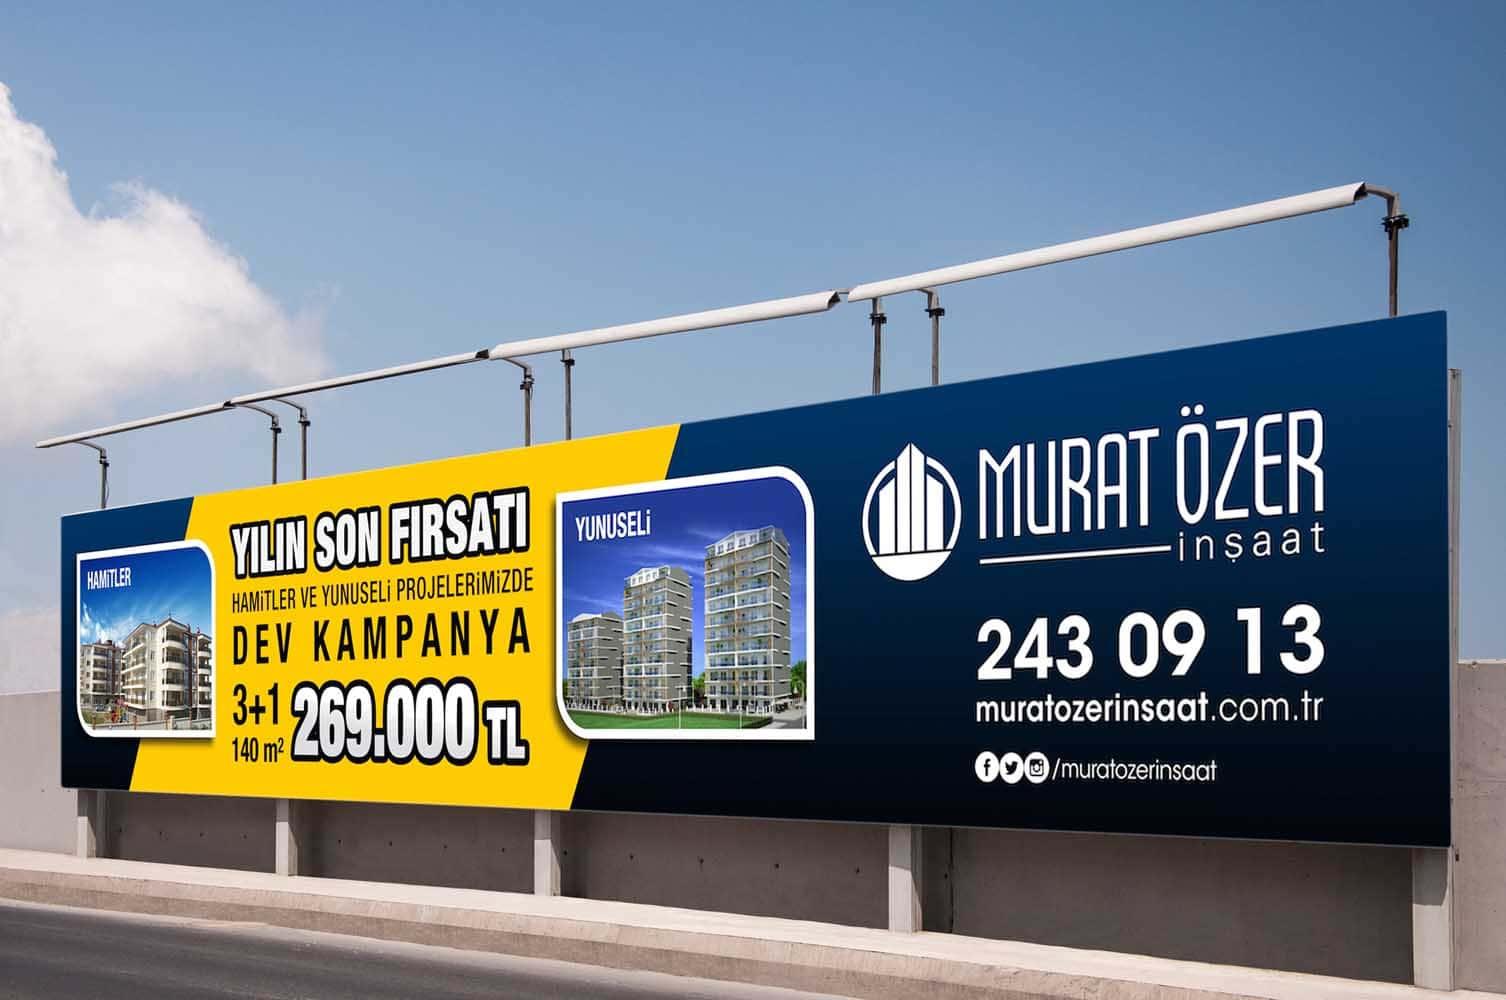 murat-ozer-yunuseli